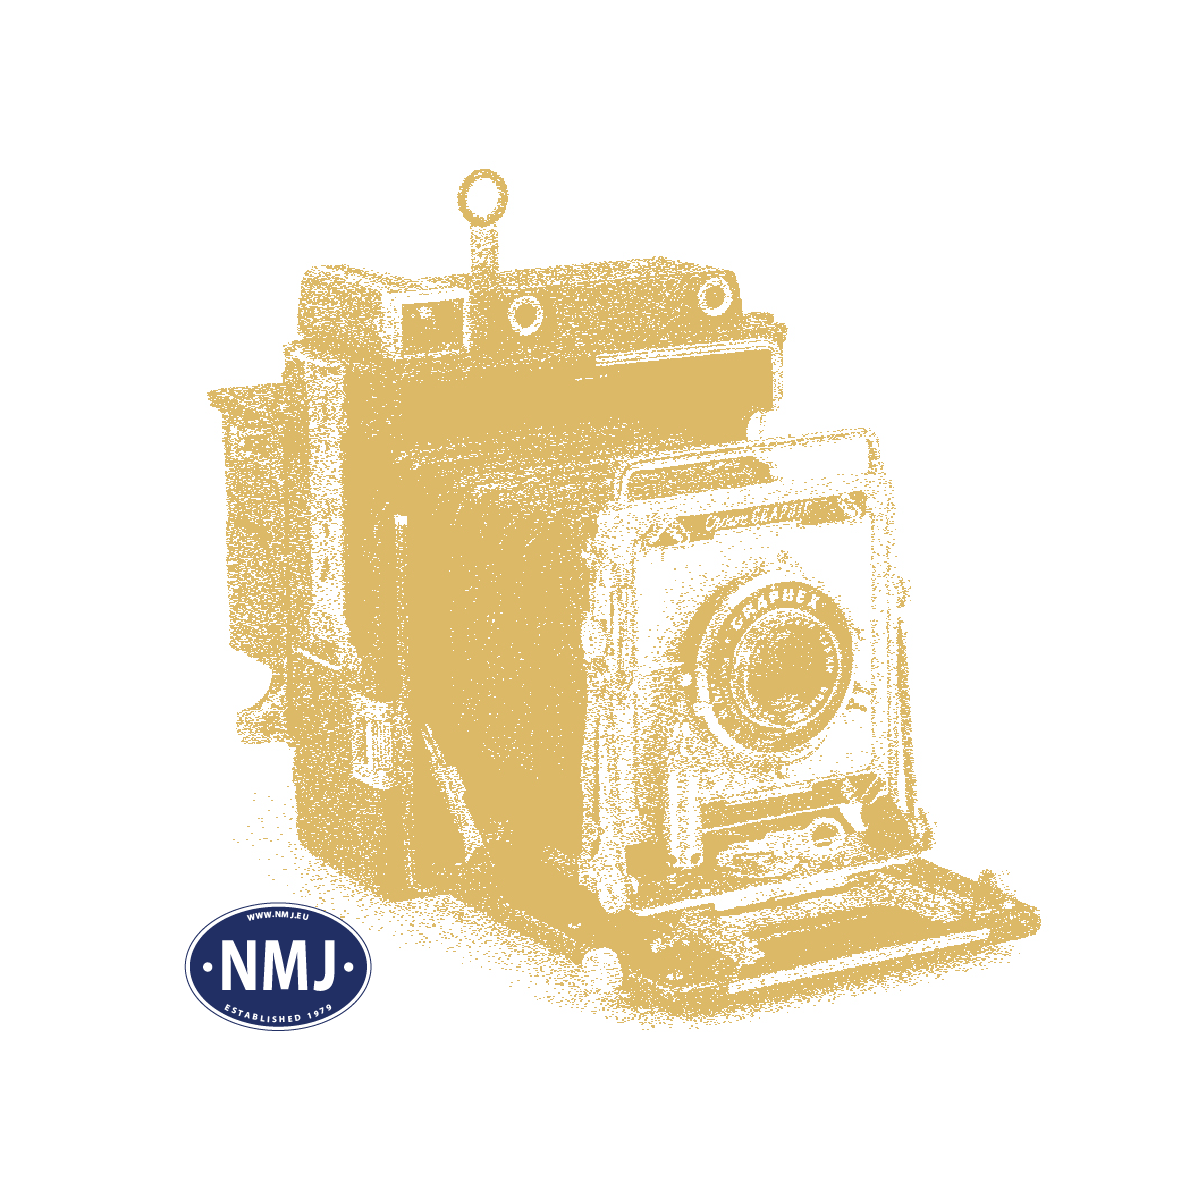 NMJT136.303 - NMJ Topline NSB CB2 21228 «Intercity Spesial» 1987-2002.